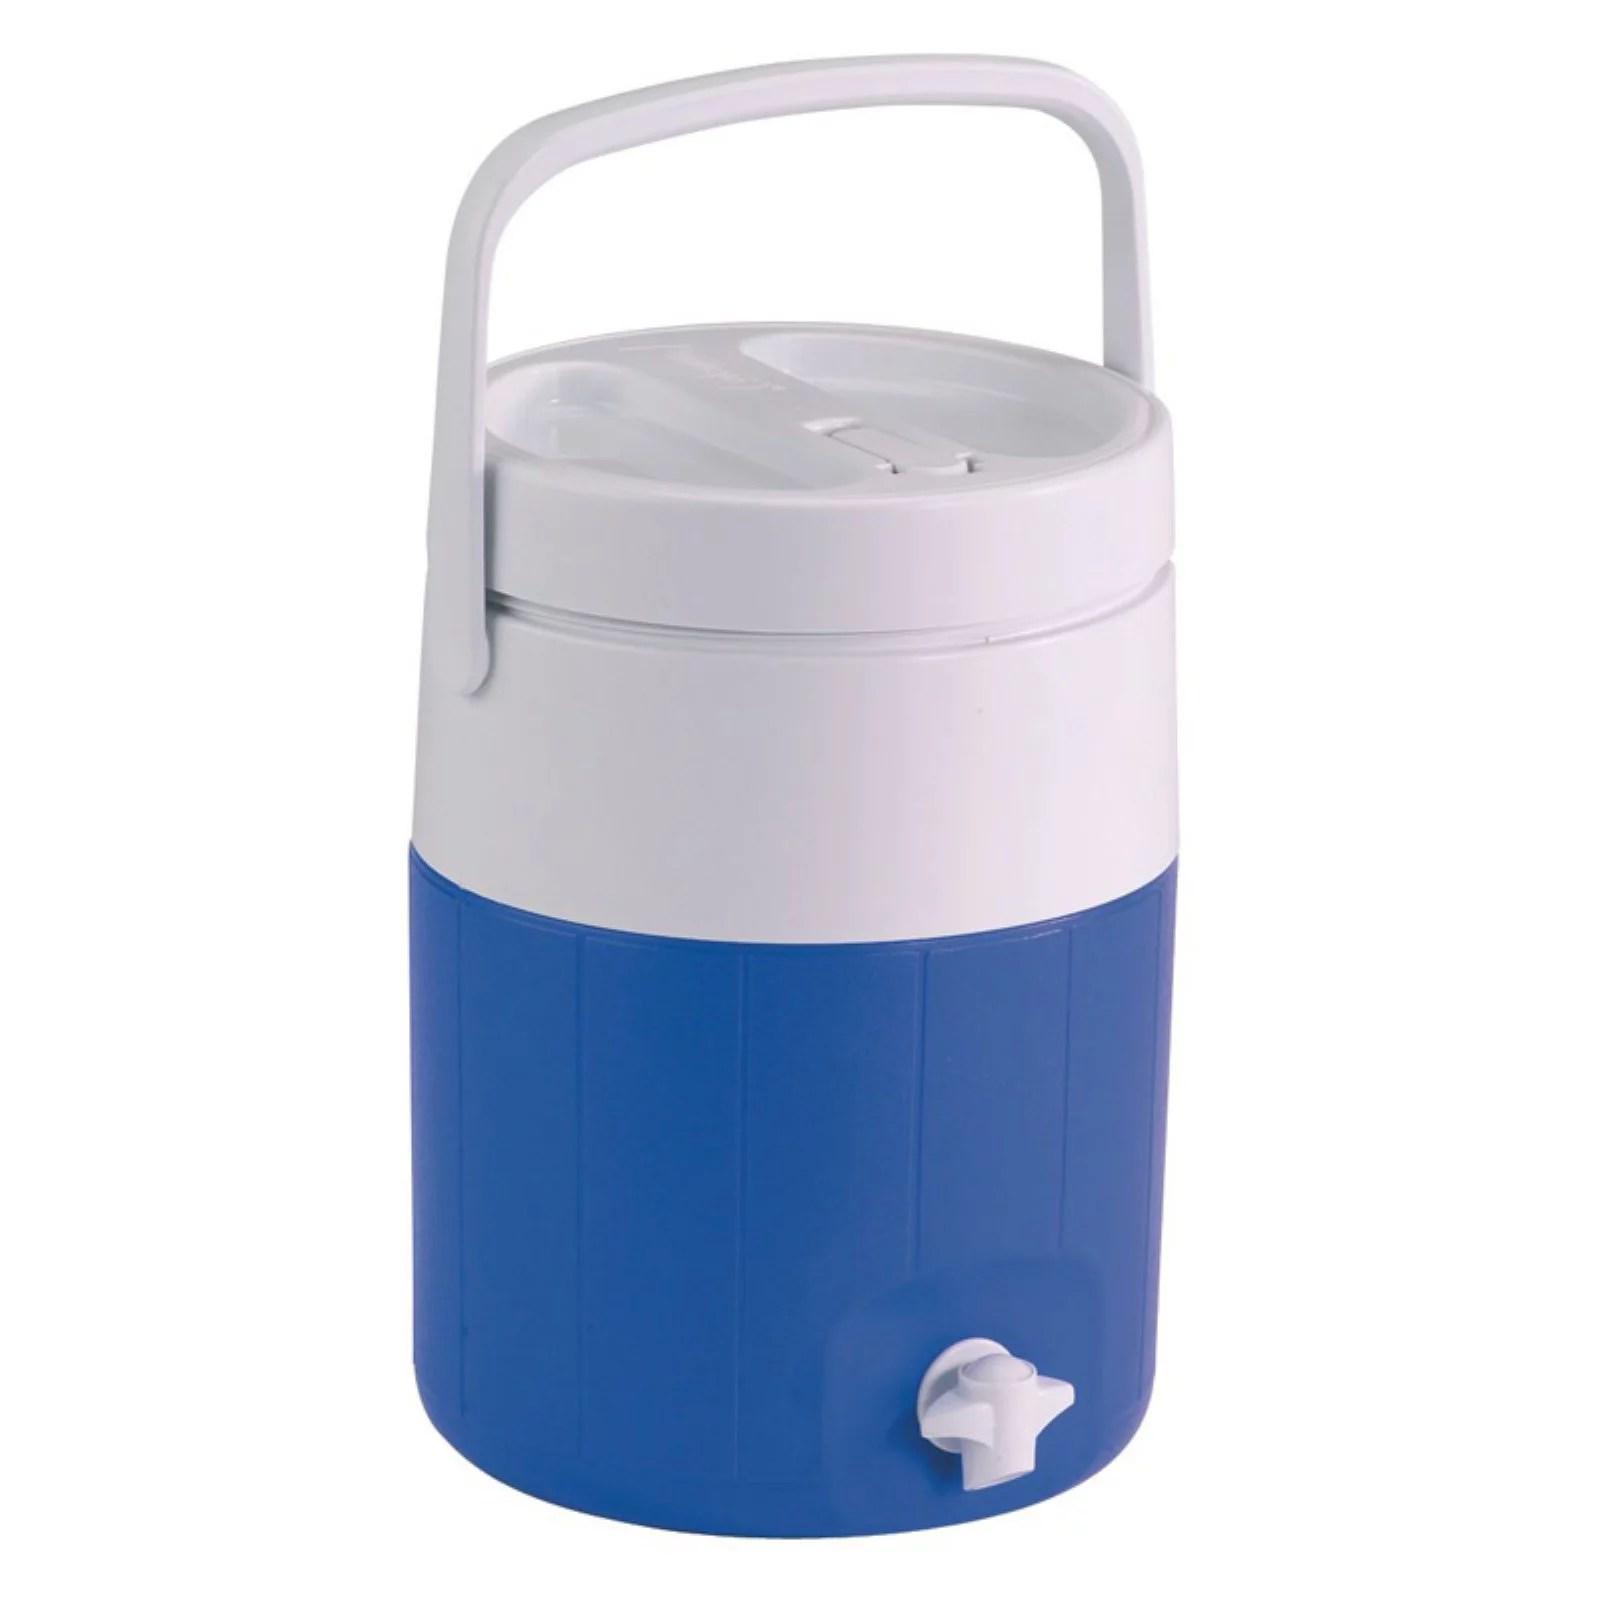 2 gallon jug with